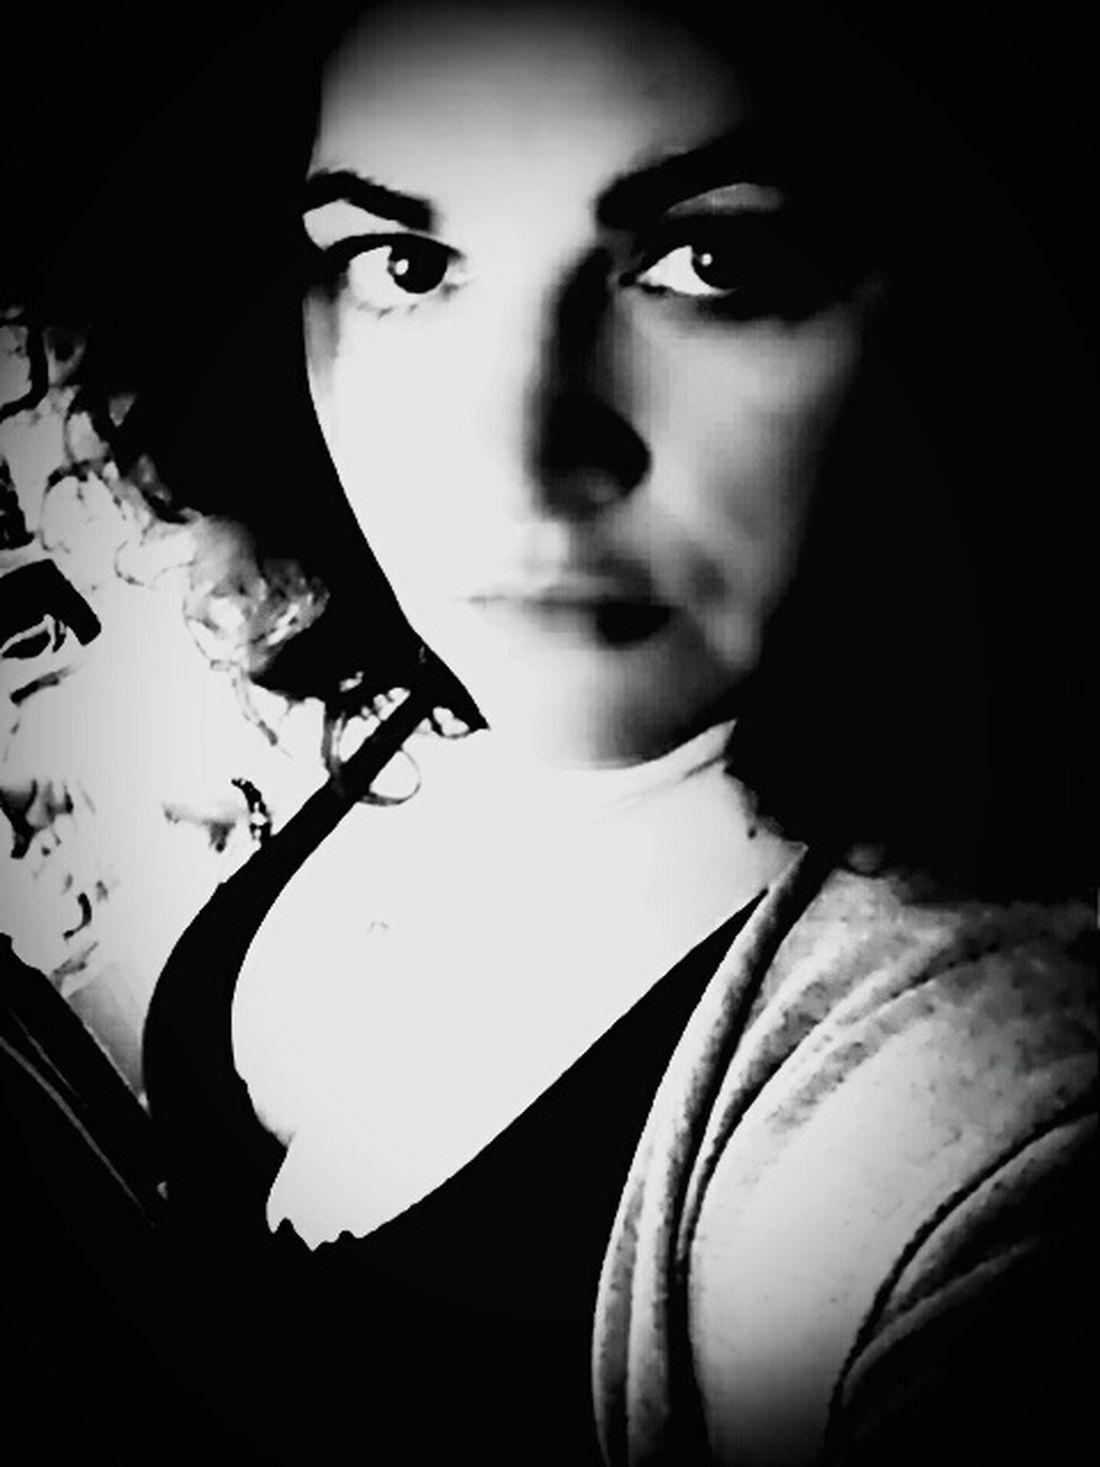 Selfportrait Sexywomen Noir Et Blanc Blackandwhite Simply Human Justbeforethenight That's Me Women With Curves Womanselfie